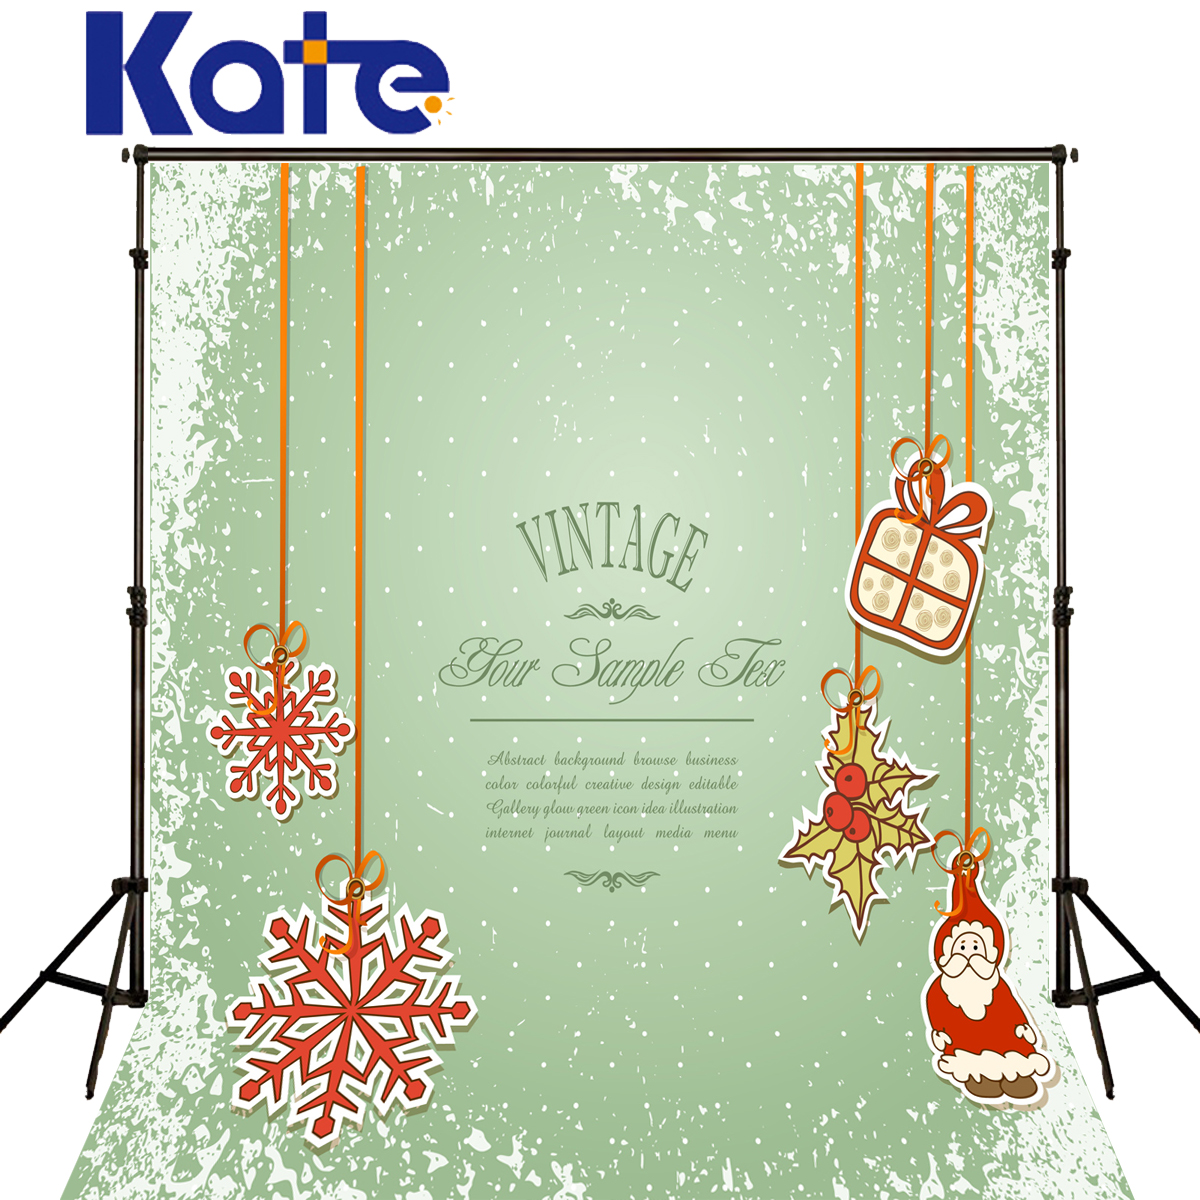 Kate Christmas Background Photography Snowflake Spot Fall Fundo Fotografico Madeira Green Screen Backdrop For Photo Shoot<br>